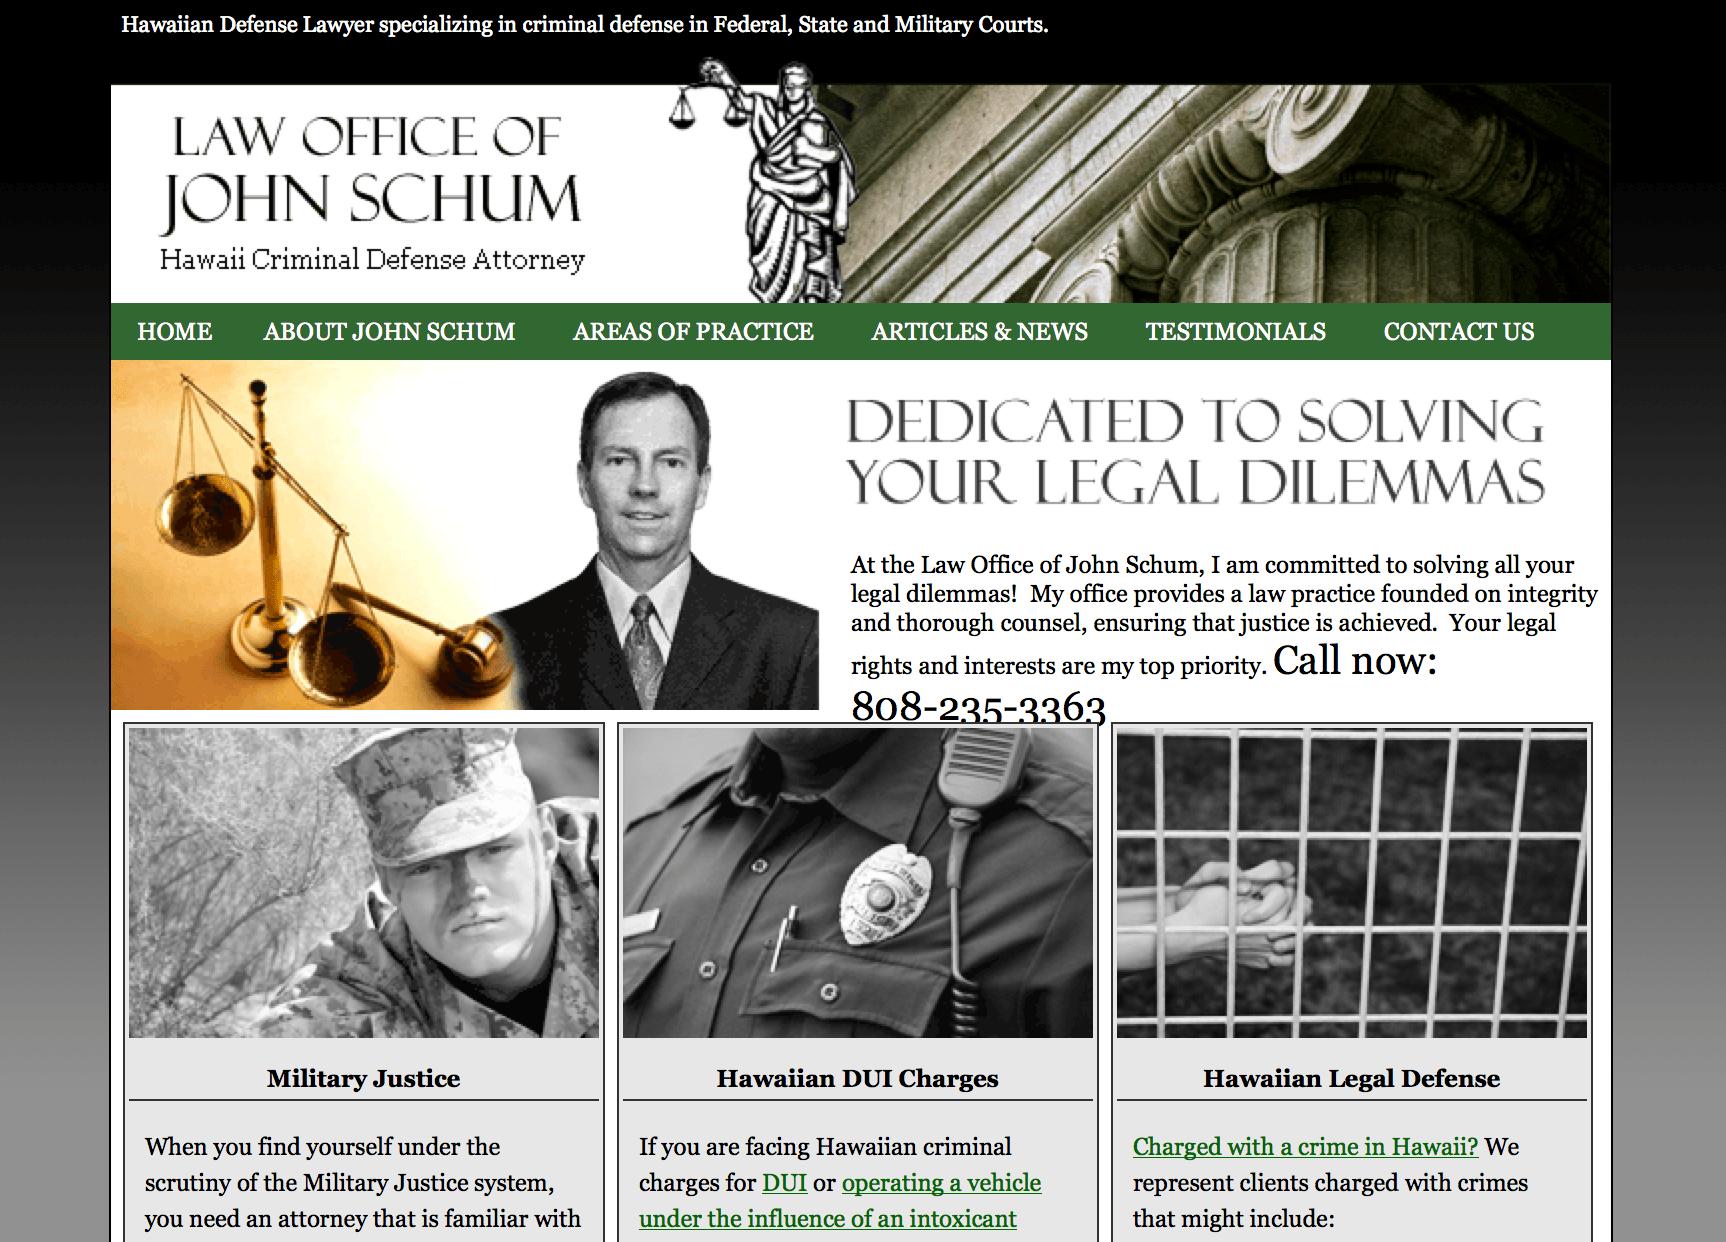 John Schum Law Website Design